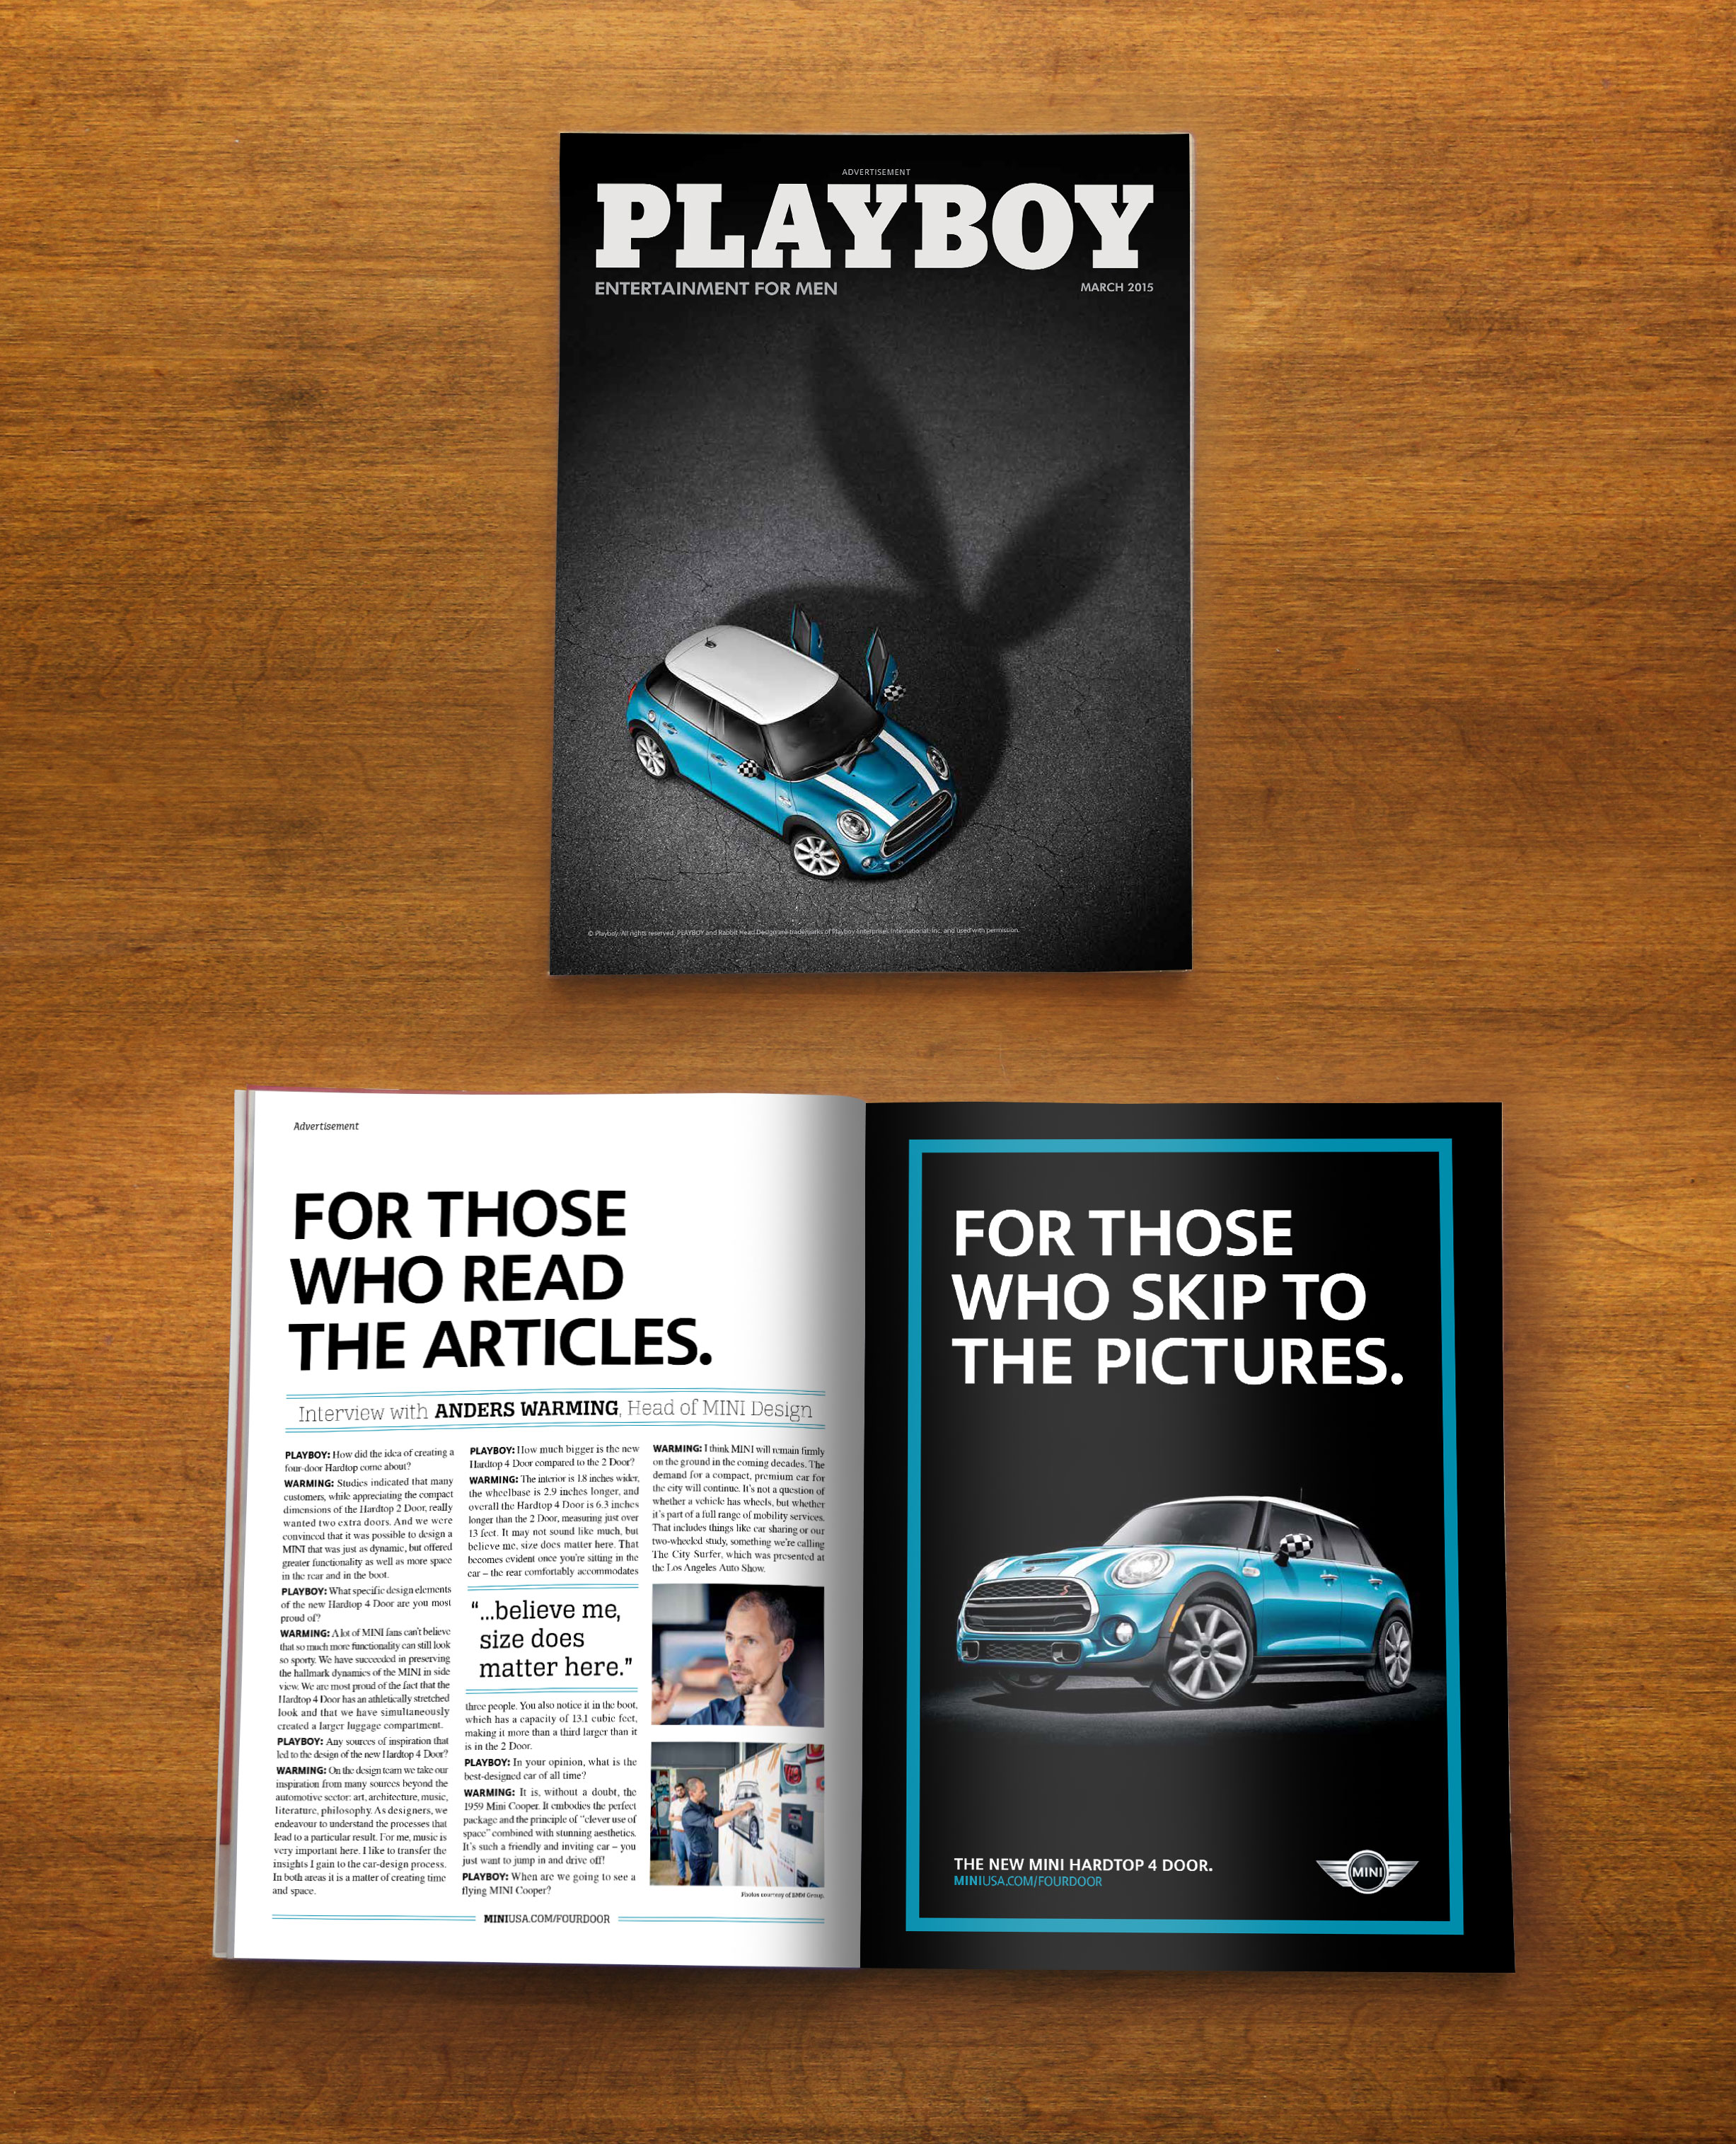 NEW-PLAYBOY-2.jpg